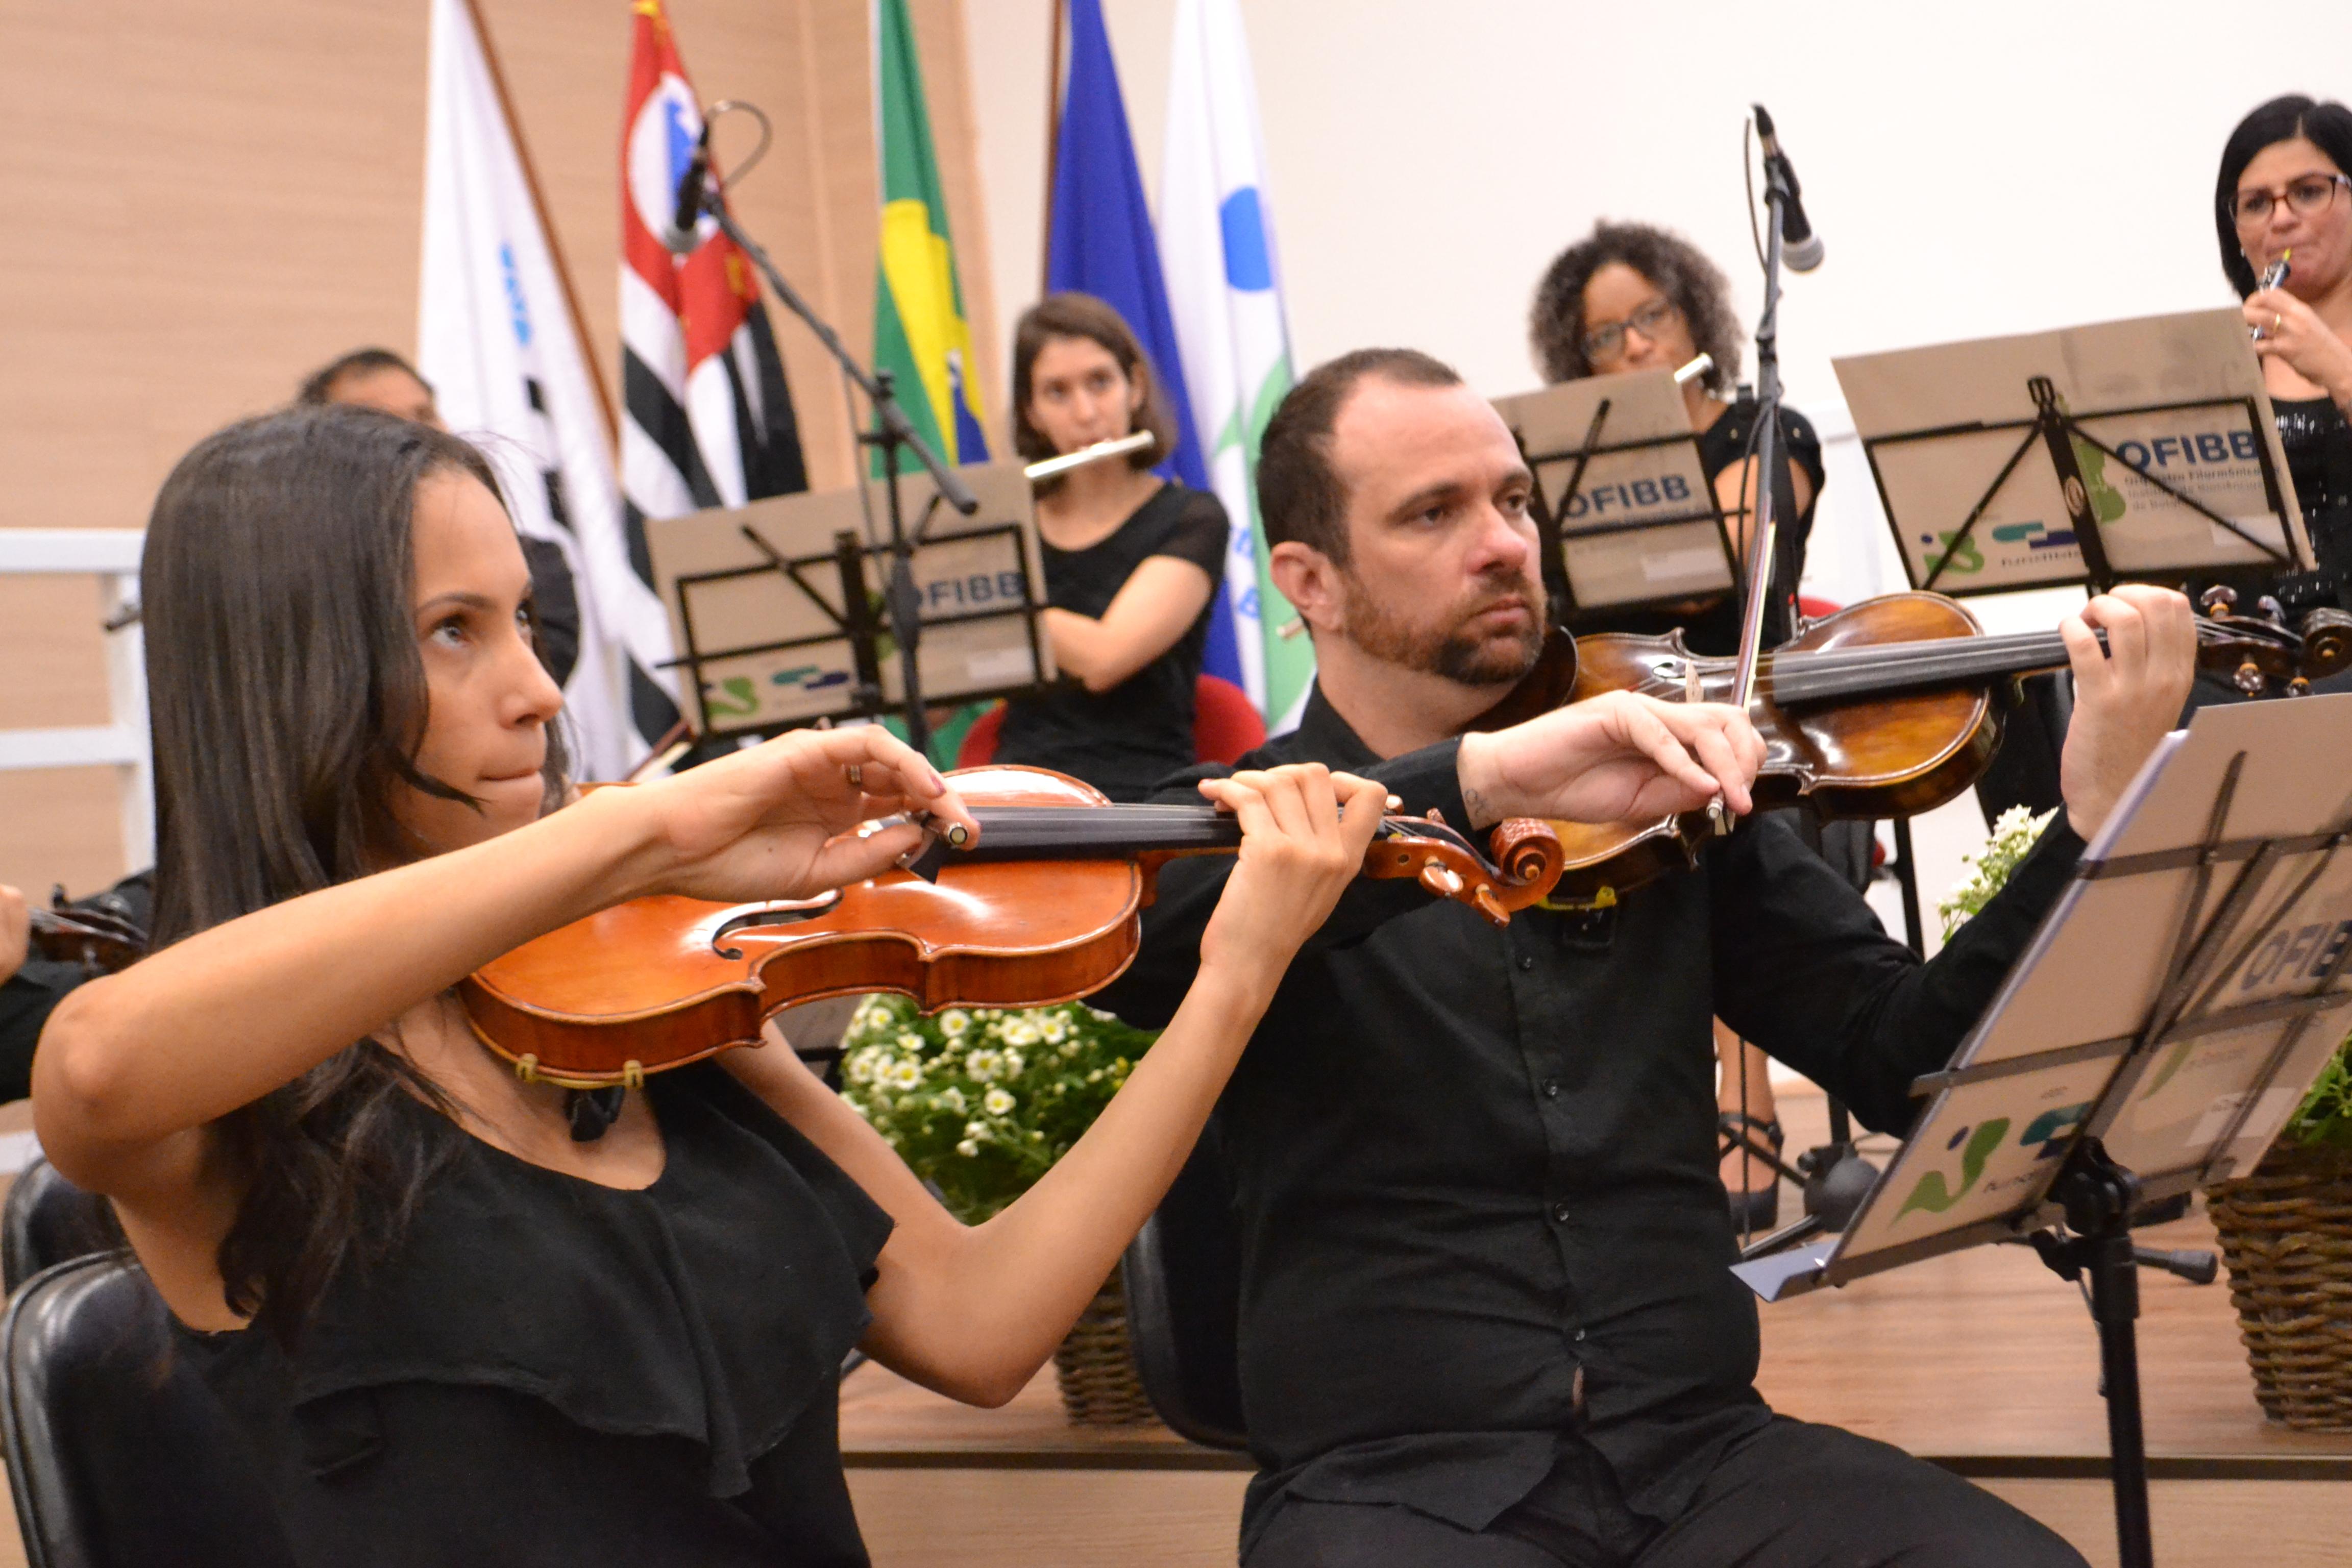 MOSTRA-MUSICAL-ORQUESTRA-FILARMONICA-IBB---FOTO-IGOR-MEDEIROS--56-